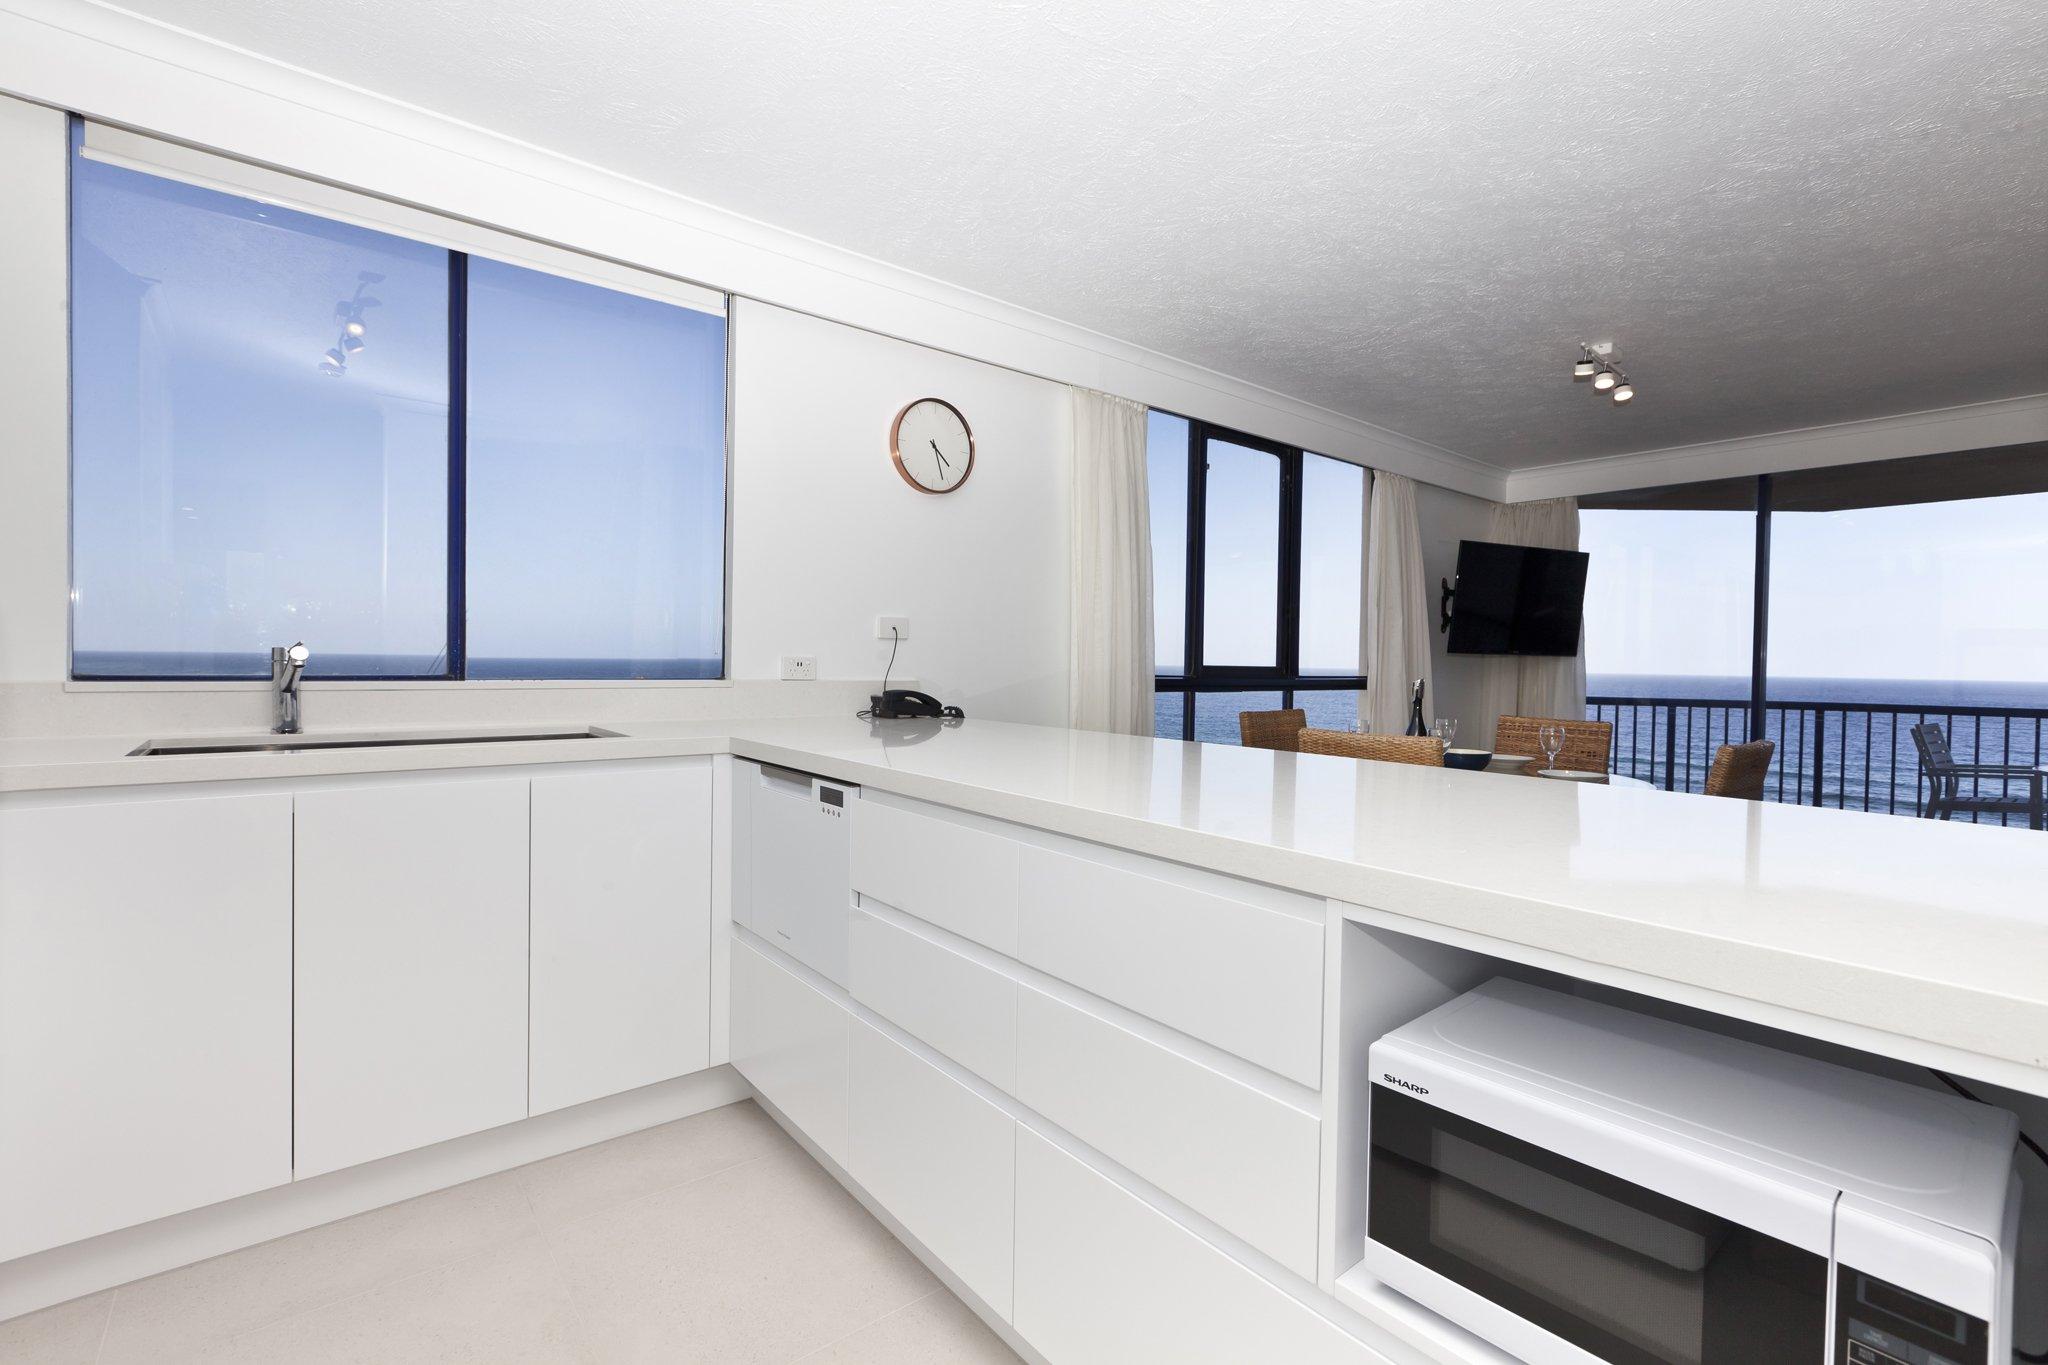 Surf Regency Holiday Apartments Kitchen